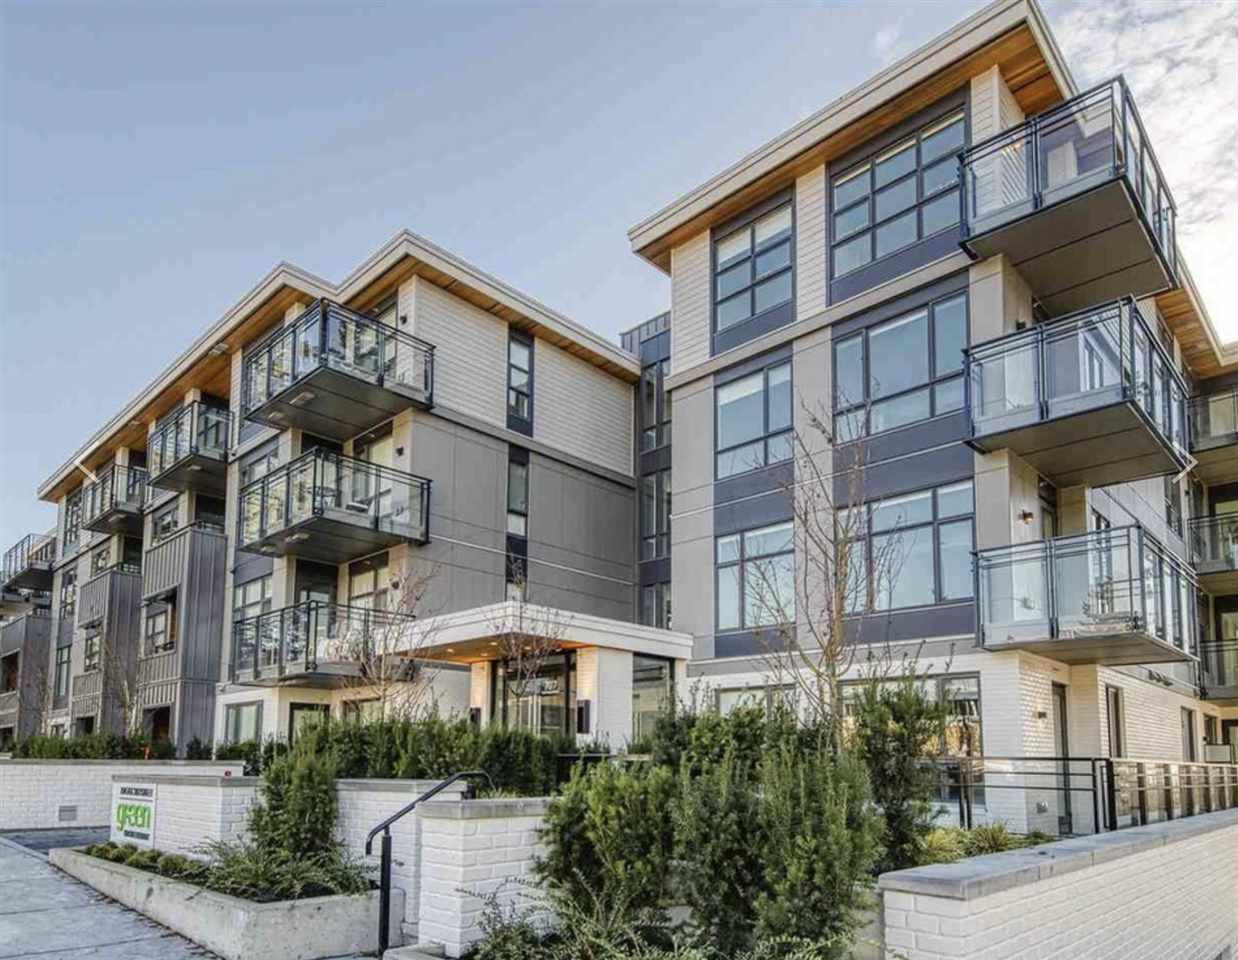 Main Photo: 301 707 E 3 Street in North Vancouver: Queensbury Condo for sale : MLS®# R2414187